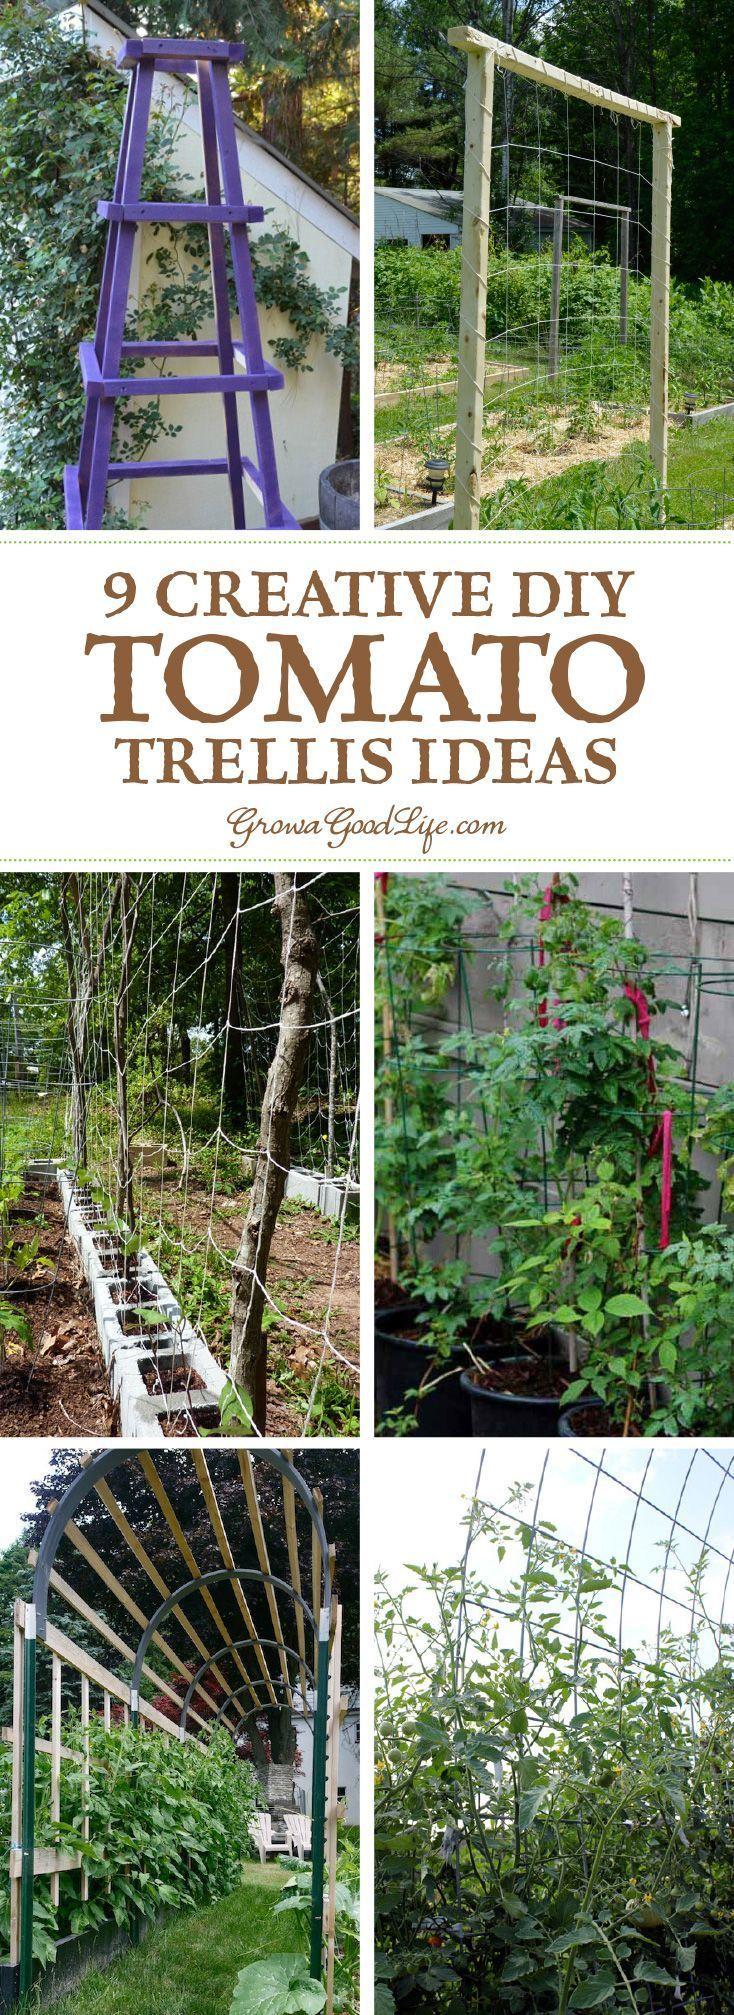 25 Best Ideas About Diy Trellis On Pinterest Trellis Ideas - induced ...